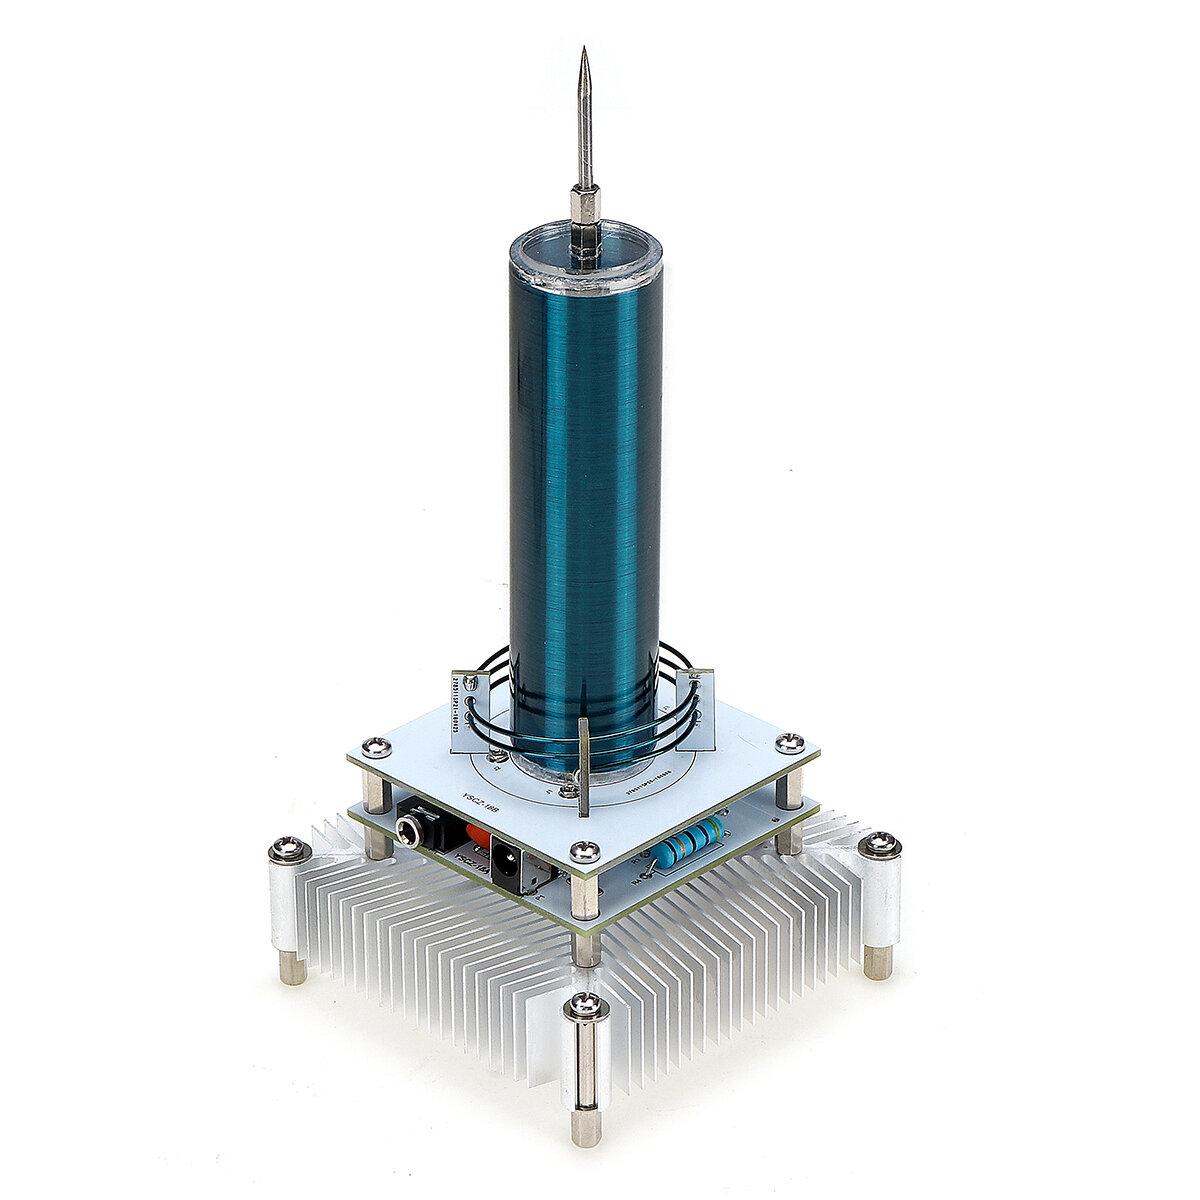 Electrónica Música Tesla Módulo de bobina Altavoz Plasma Transmisión inalámbrica Sonido Ciencia sólida